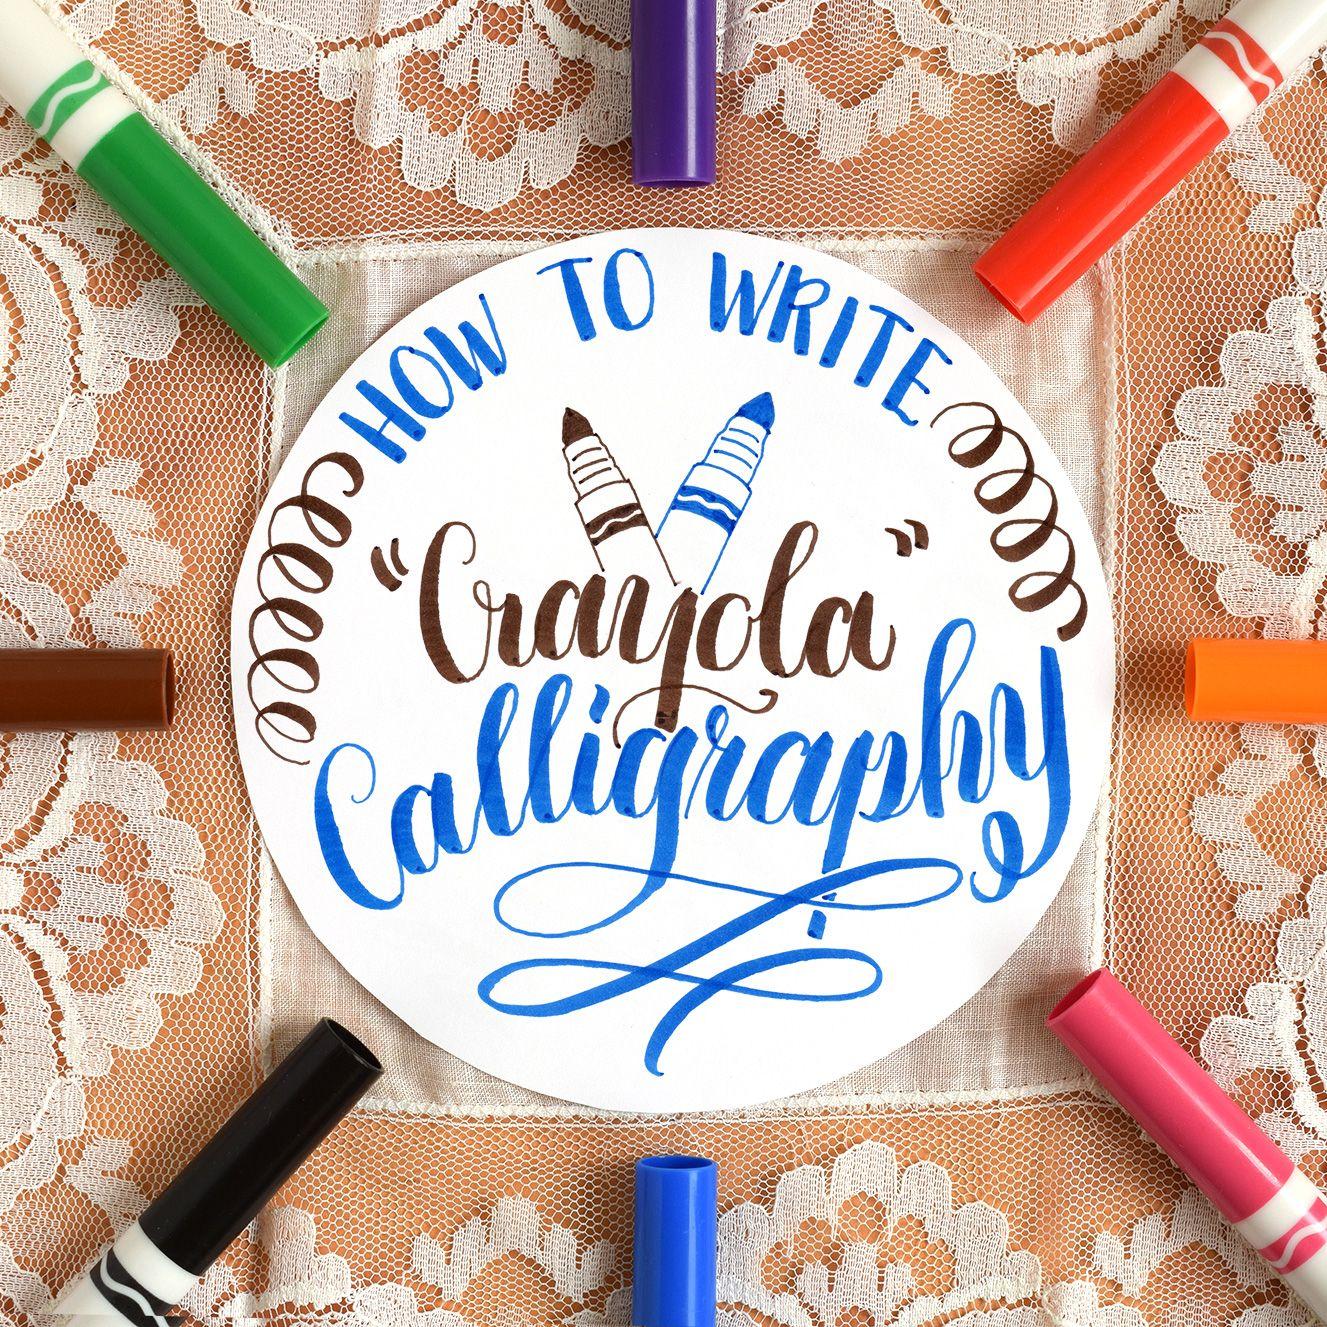 How To Write Crayola Calligraphy The Postman S Knock